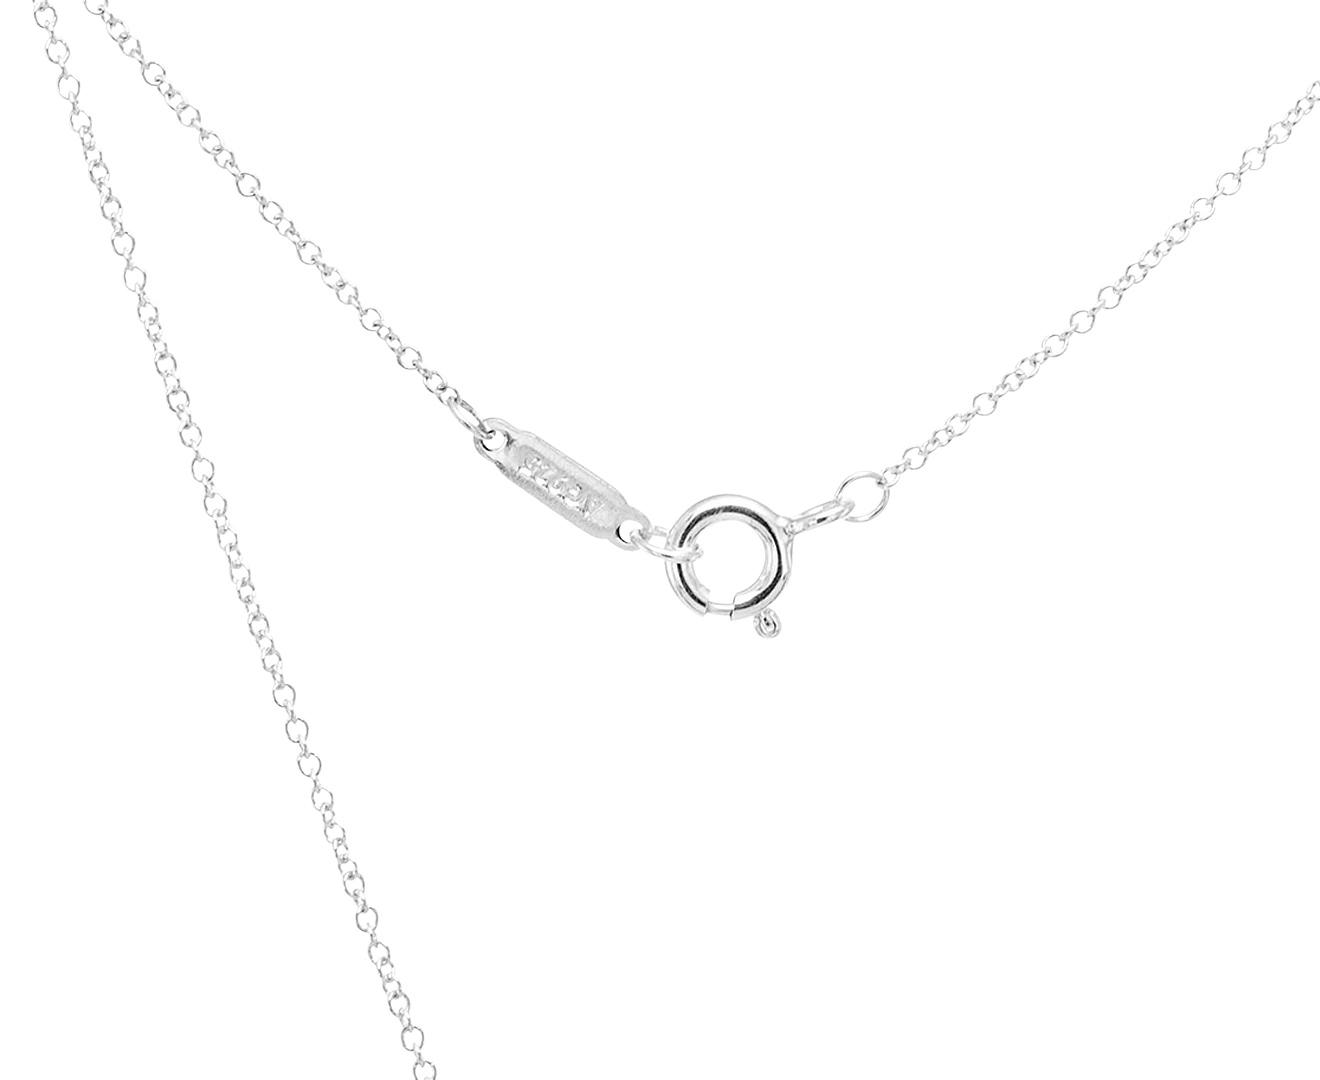 0261e5180 Tiffany & Co. Paloma's Venezia Luce Pendant w/ Chain - Silver | Catch.com.au